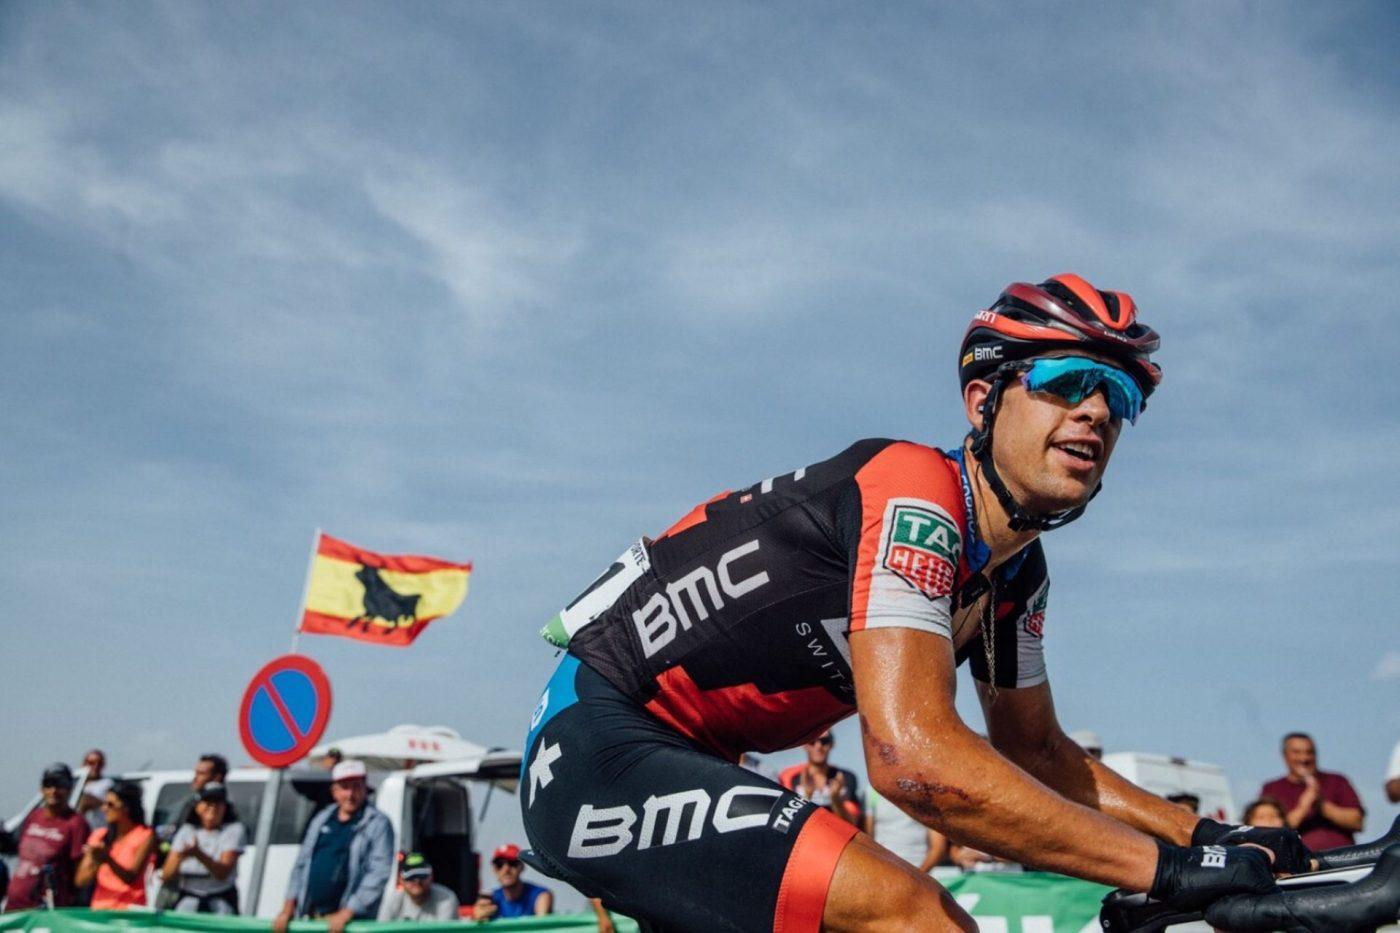 Tour de France Riders You Can Follow on Strava 3